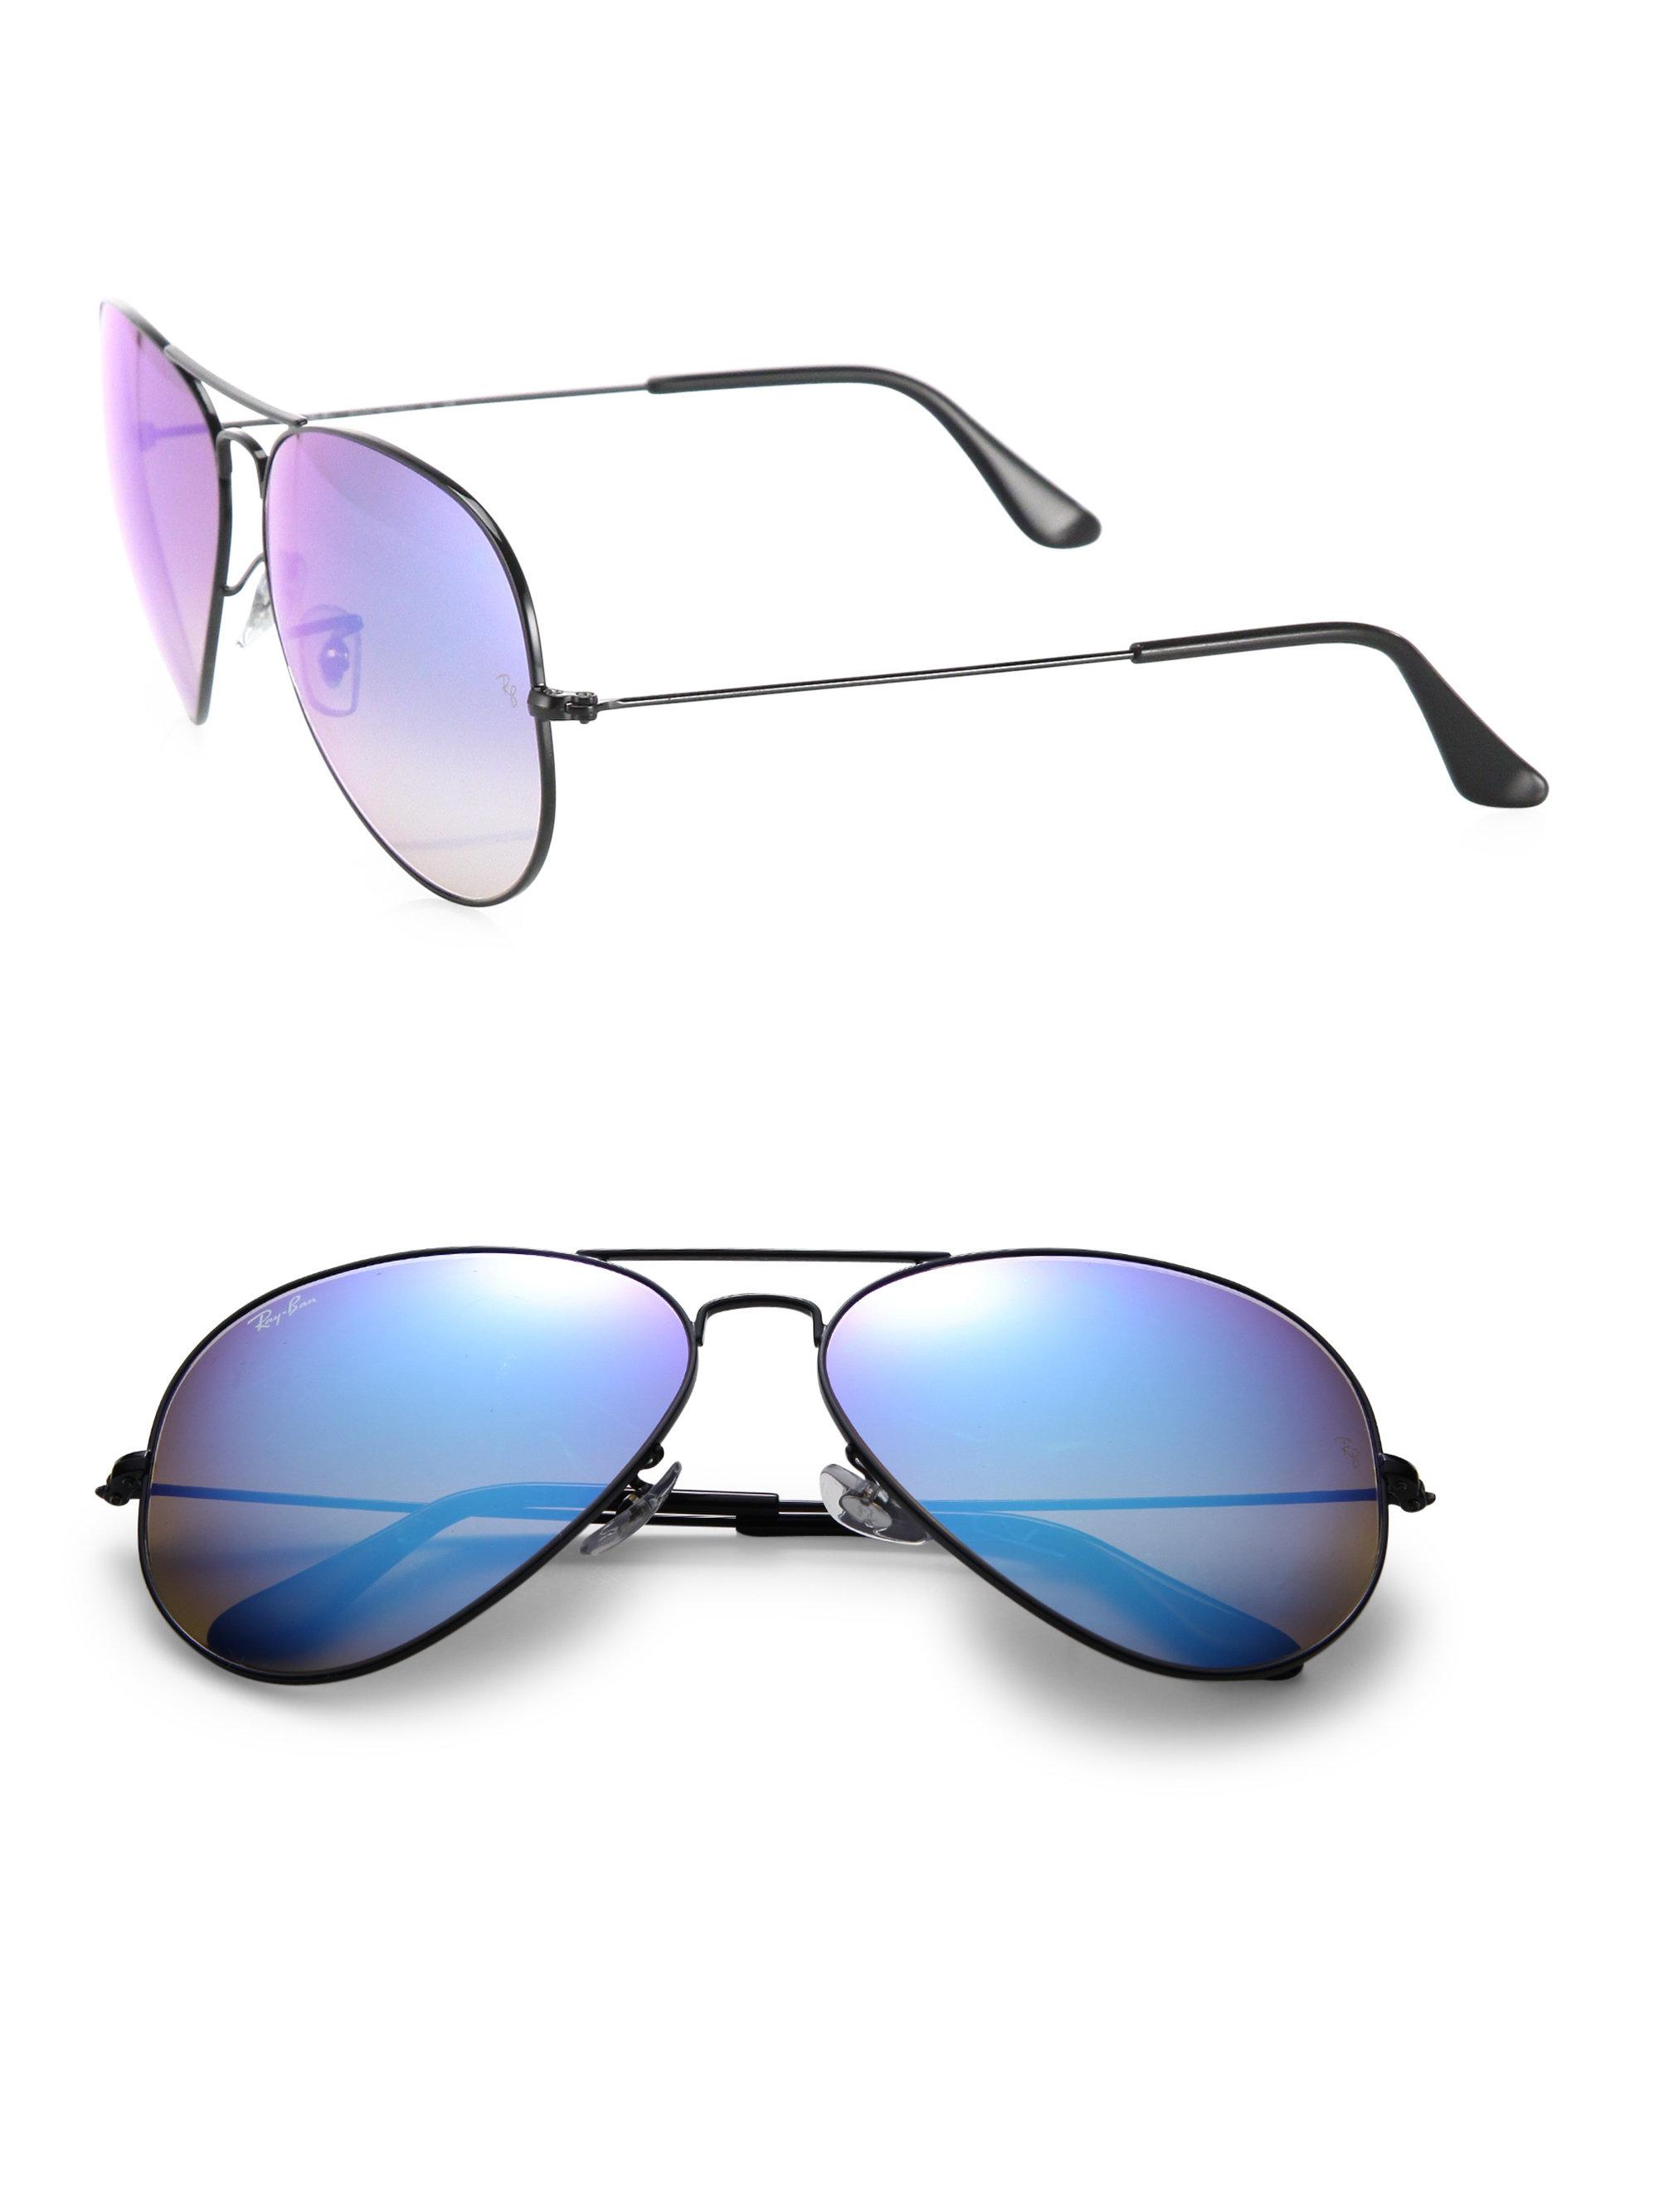 Ray Ban Mirror Aviator Sunglasses  ray ban metal mirrored aviator sunglasses in blue for men lyst